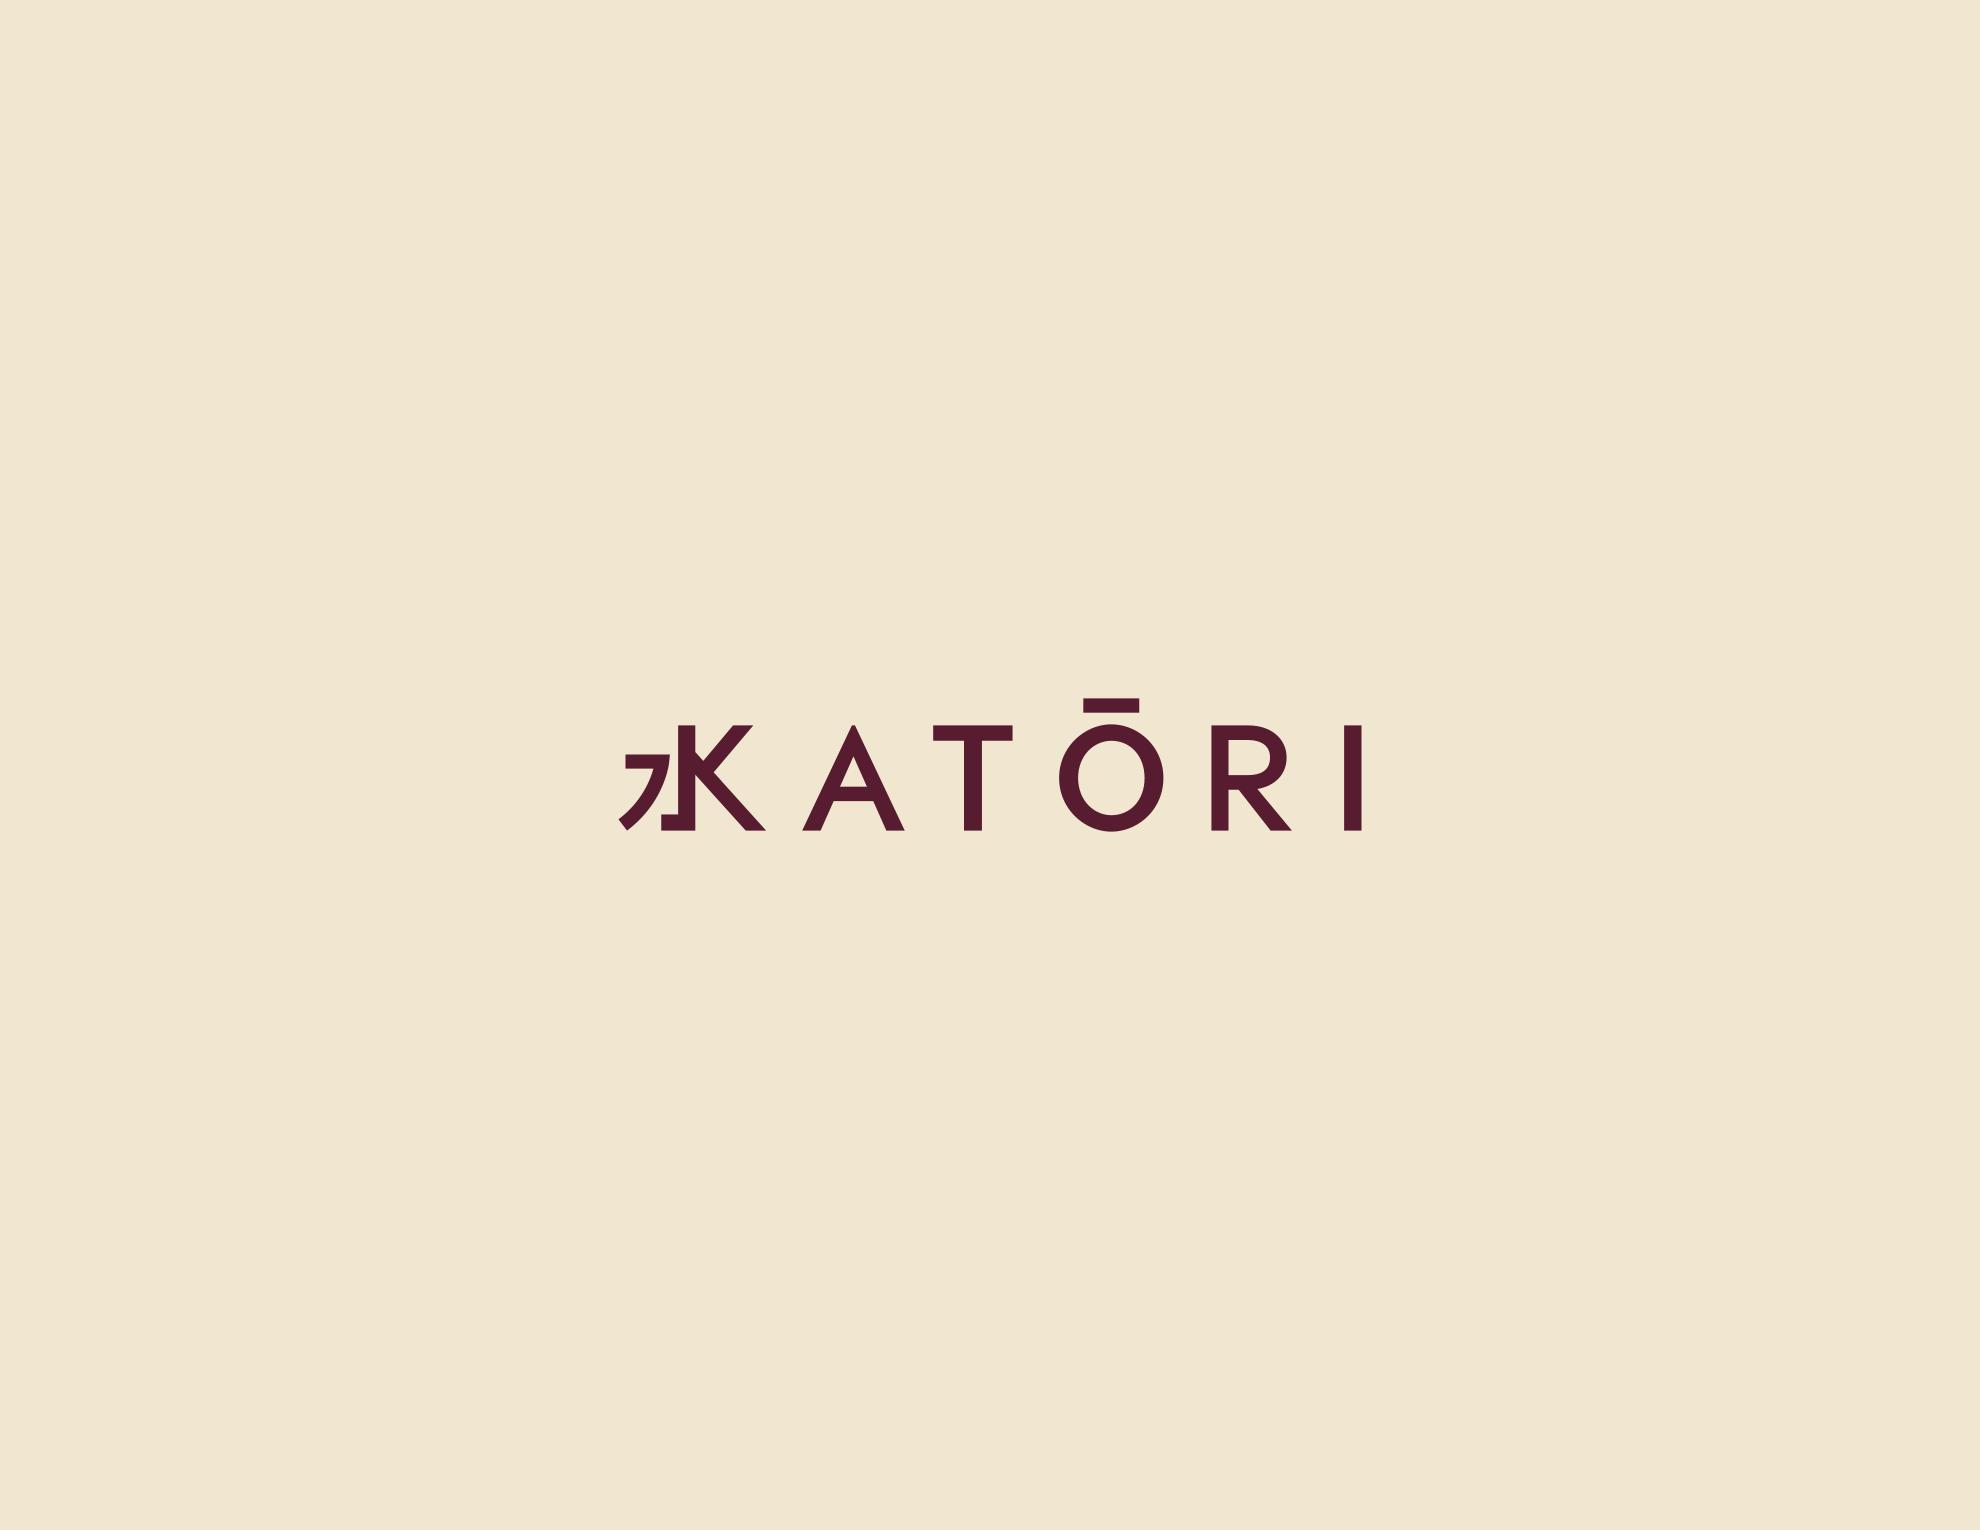 Katori-identidad-marca